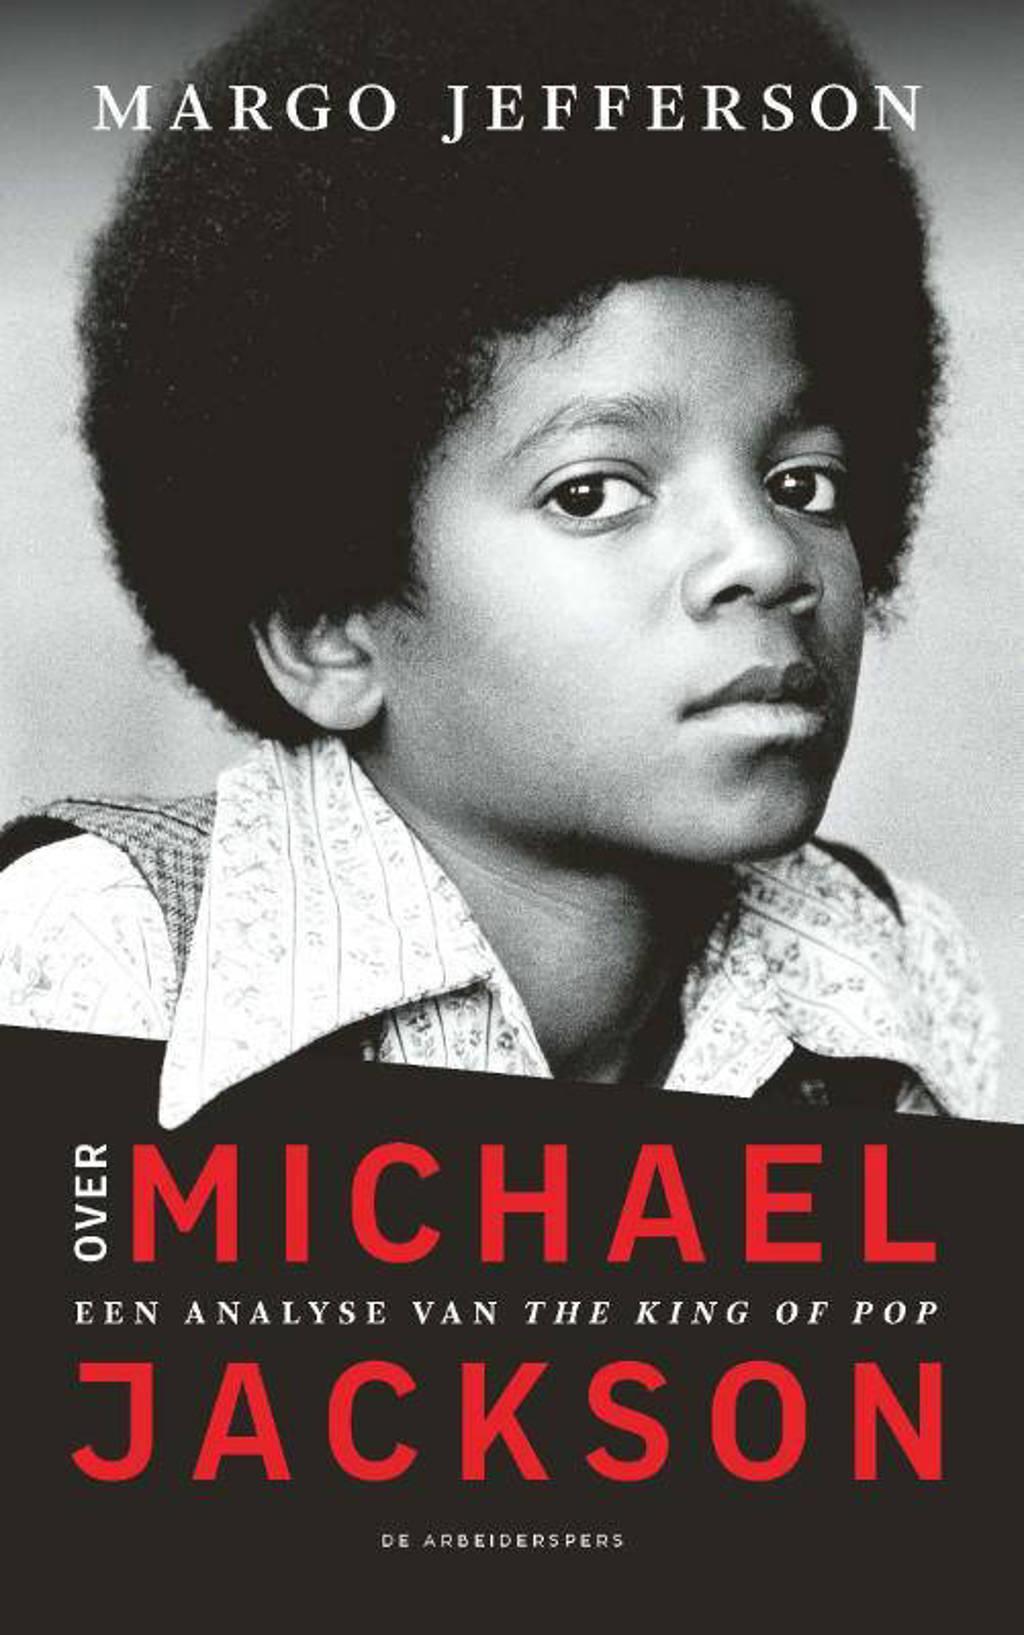 Over Michael Jackson - Margo Jefferson